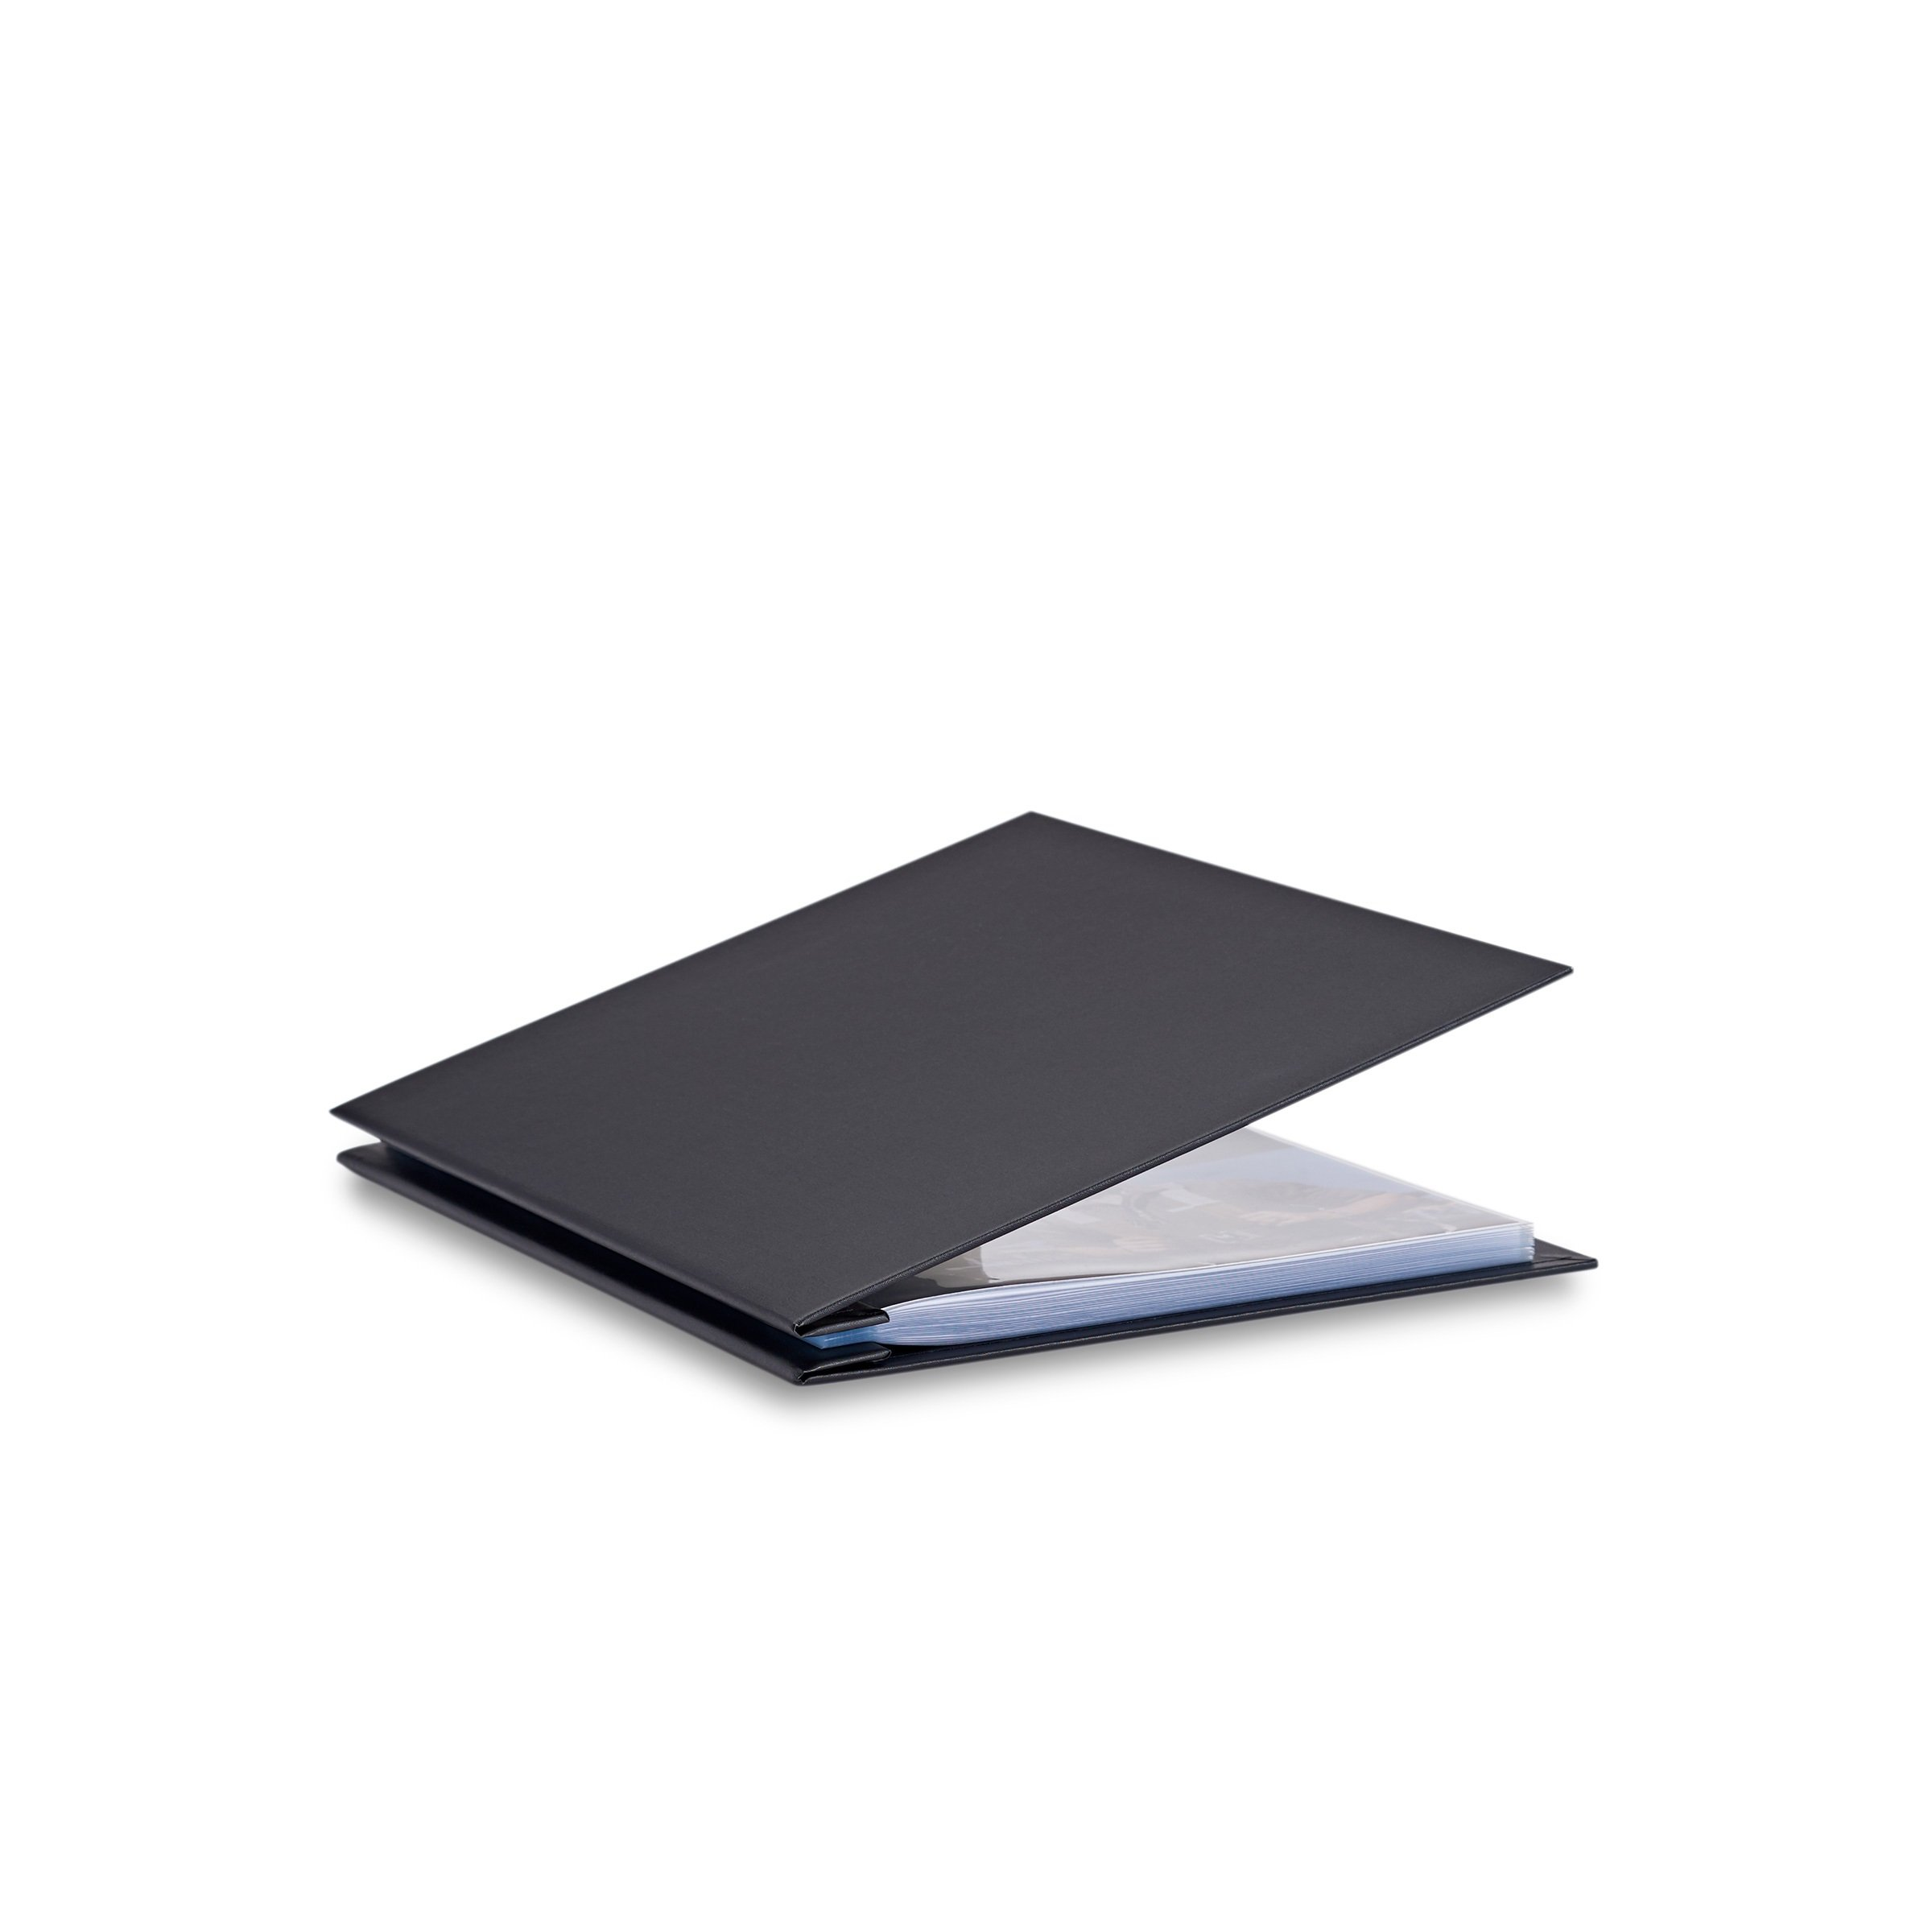 Pina Zangaro Bex Screwpost Binder, Black, 8.5x11 Portrait, Includes 20 Pro-Archive Sheet Protectors (34053)